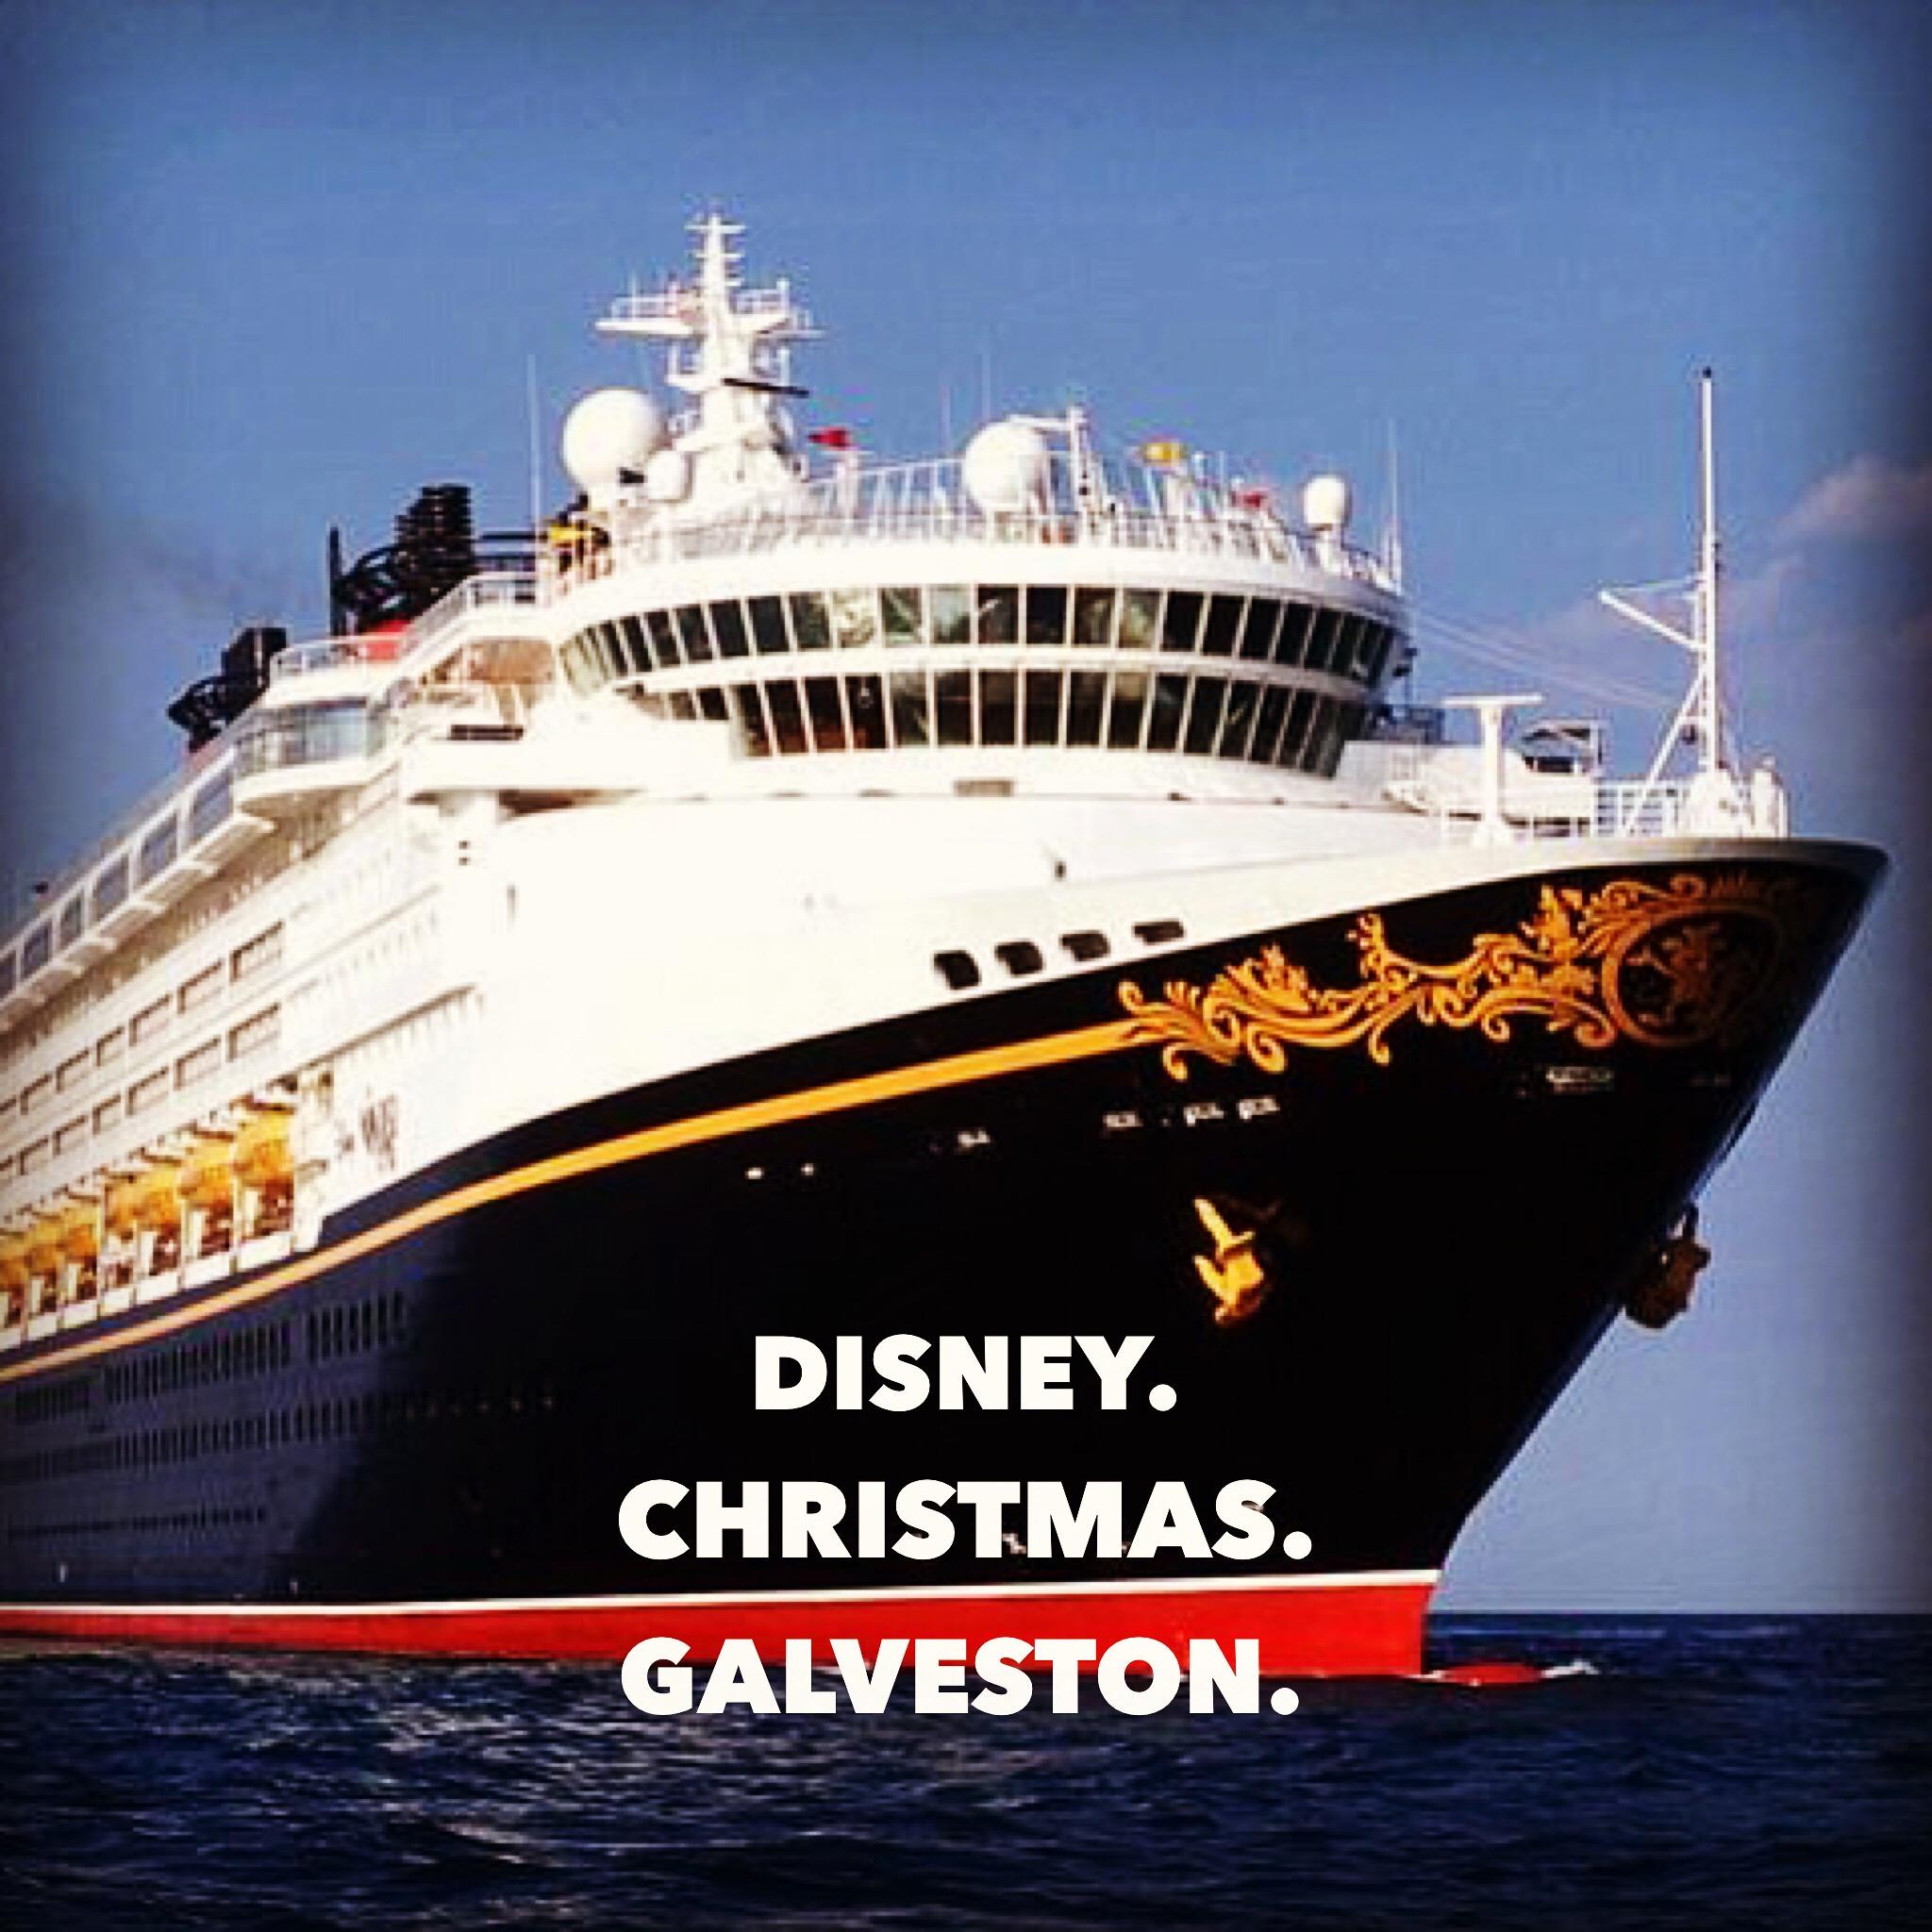 Disney sails out of Galveston, TX during the Christmas Holiday season. Texans flock to the port to enjoy the seasonal delight.